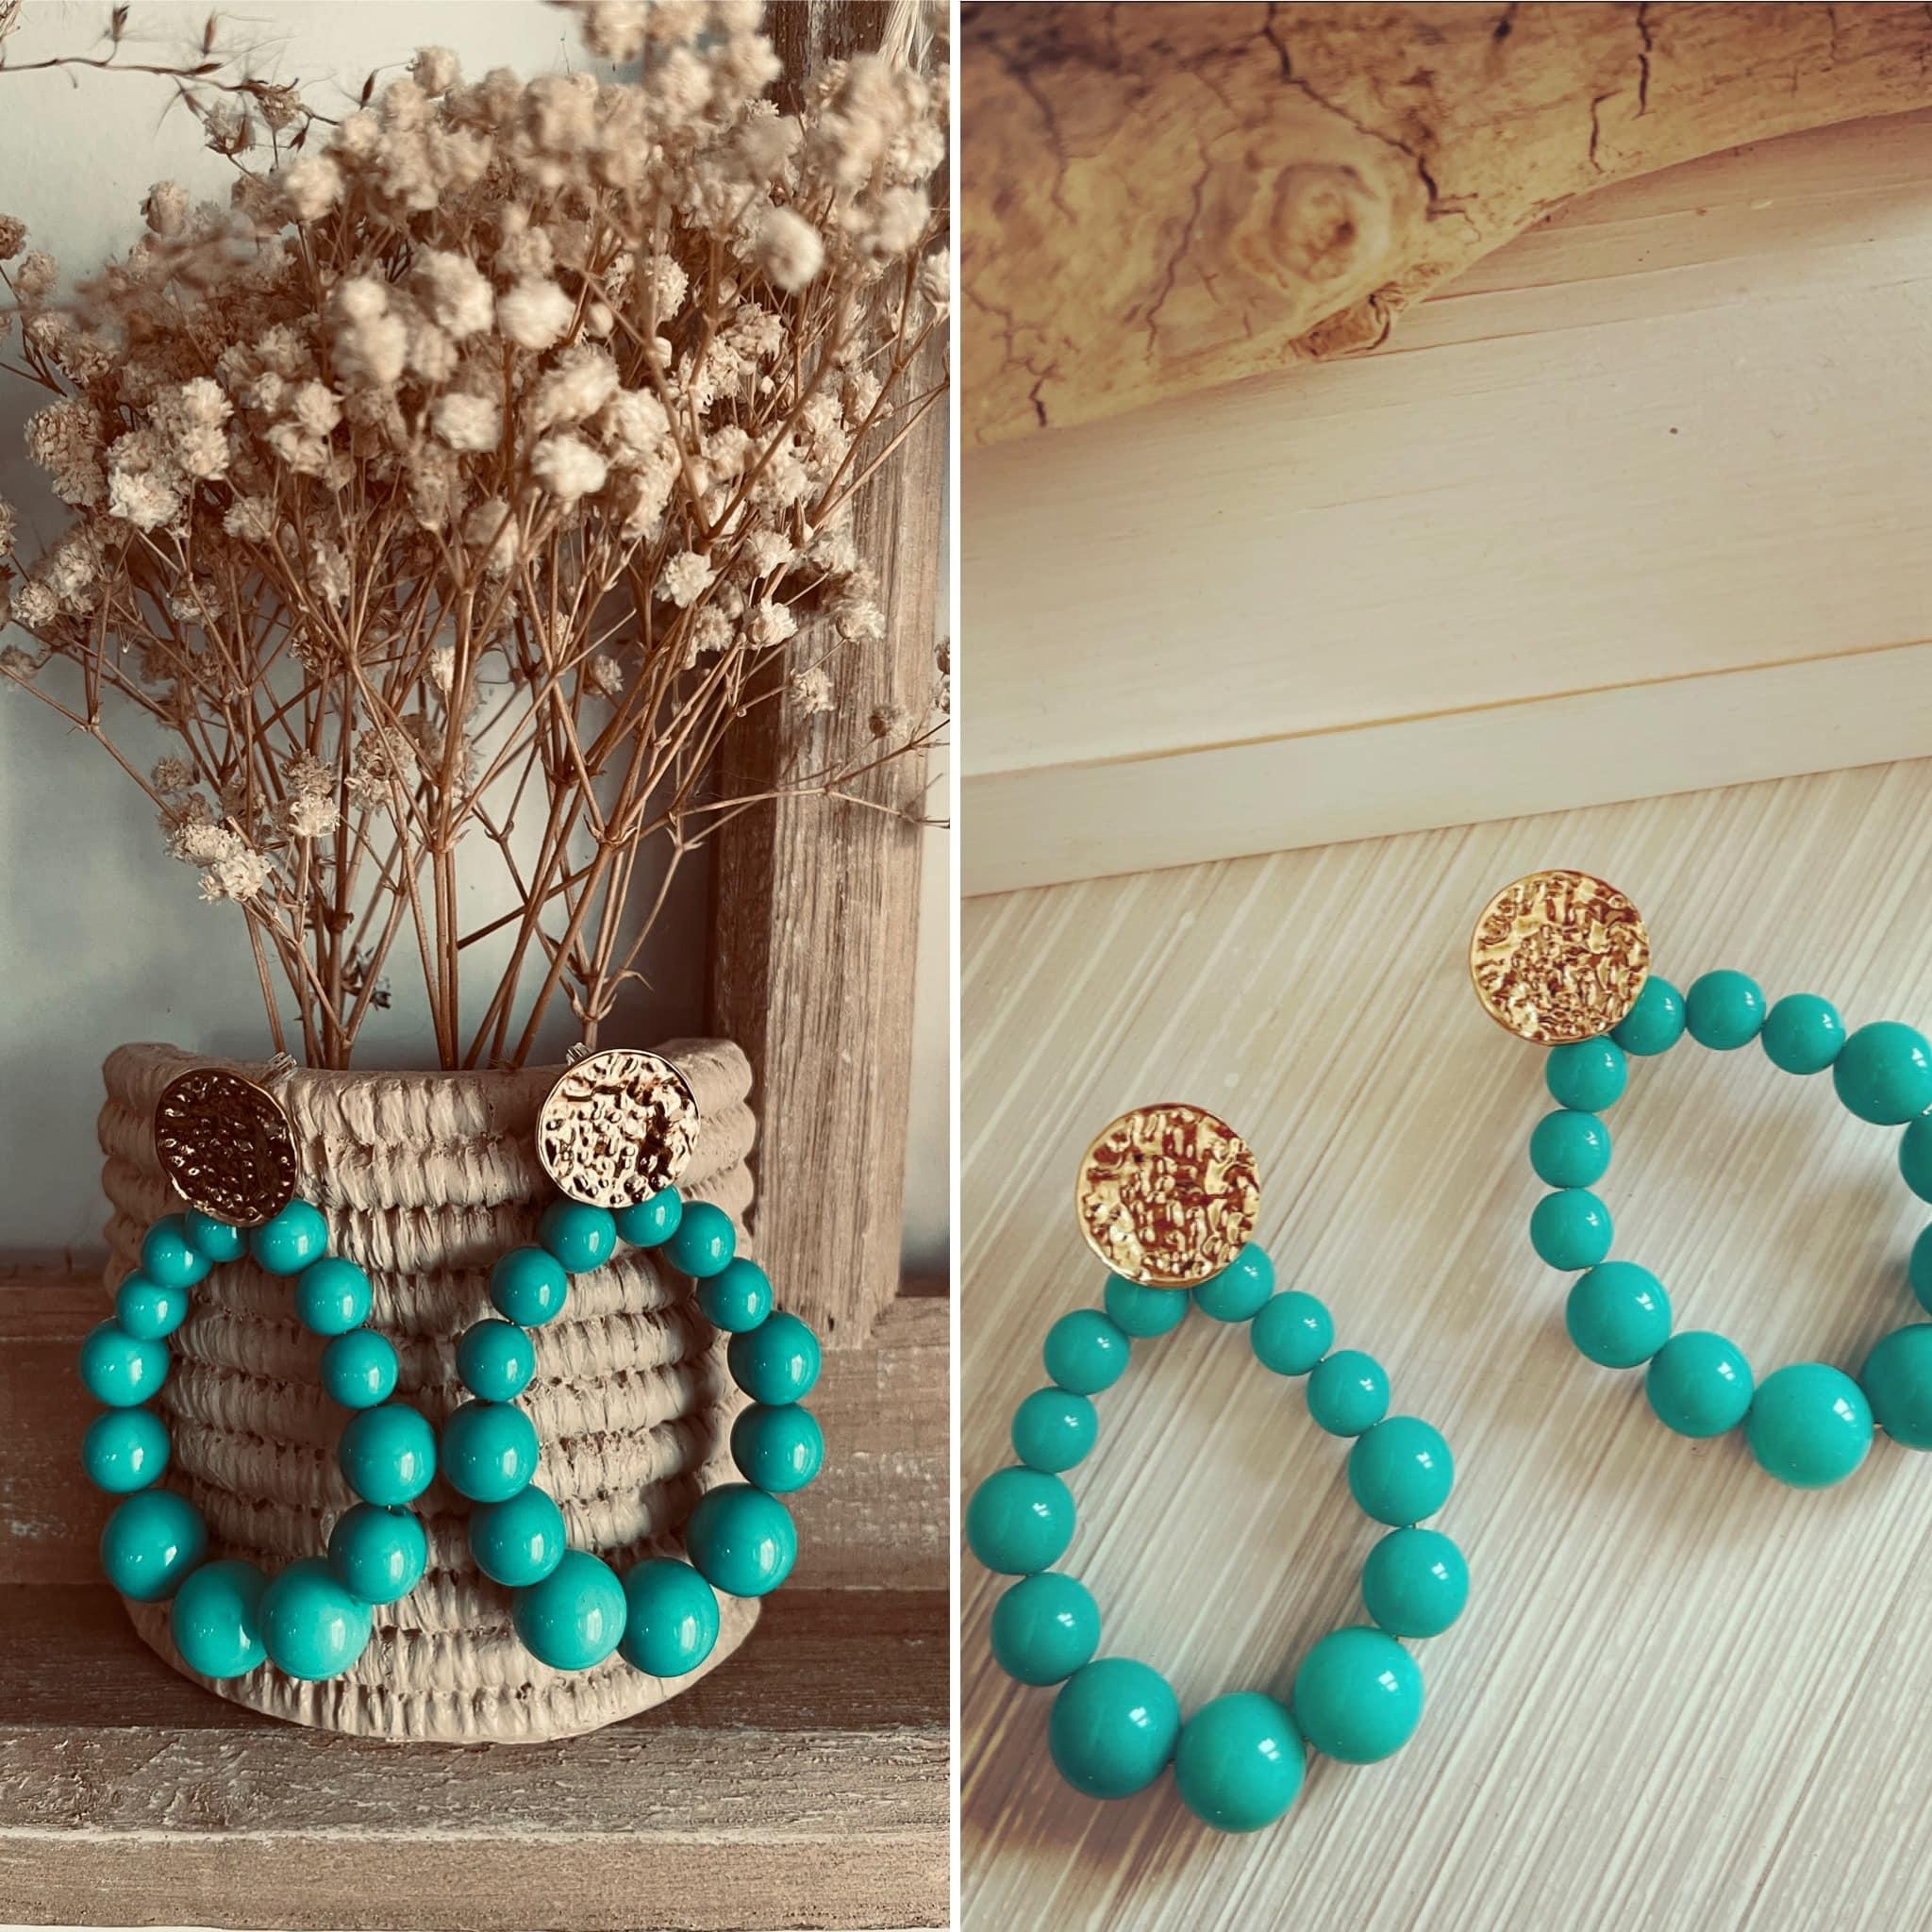 Boucles perles vertes en ACIER